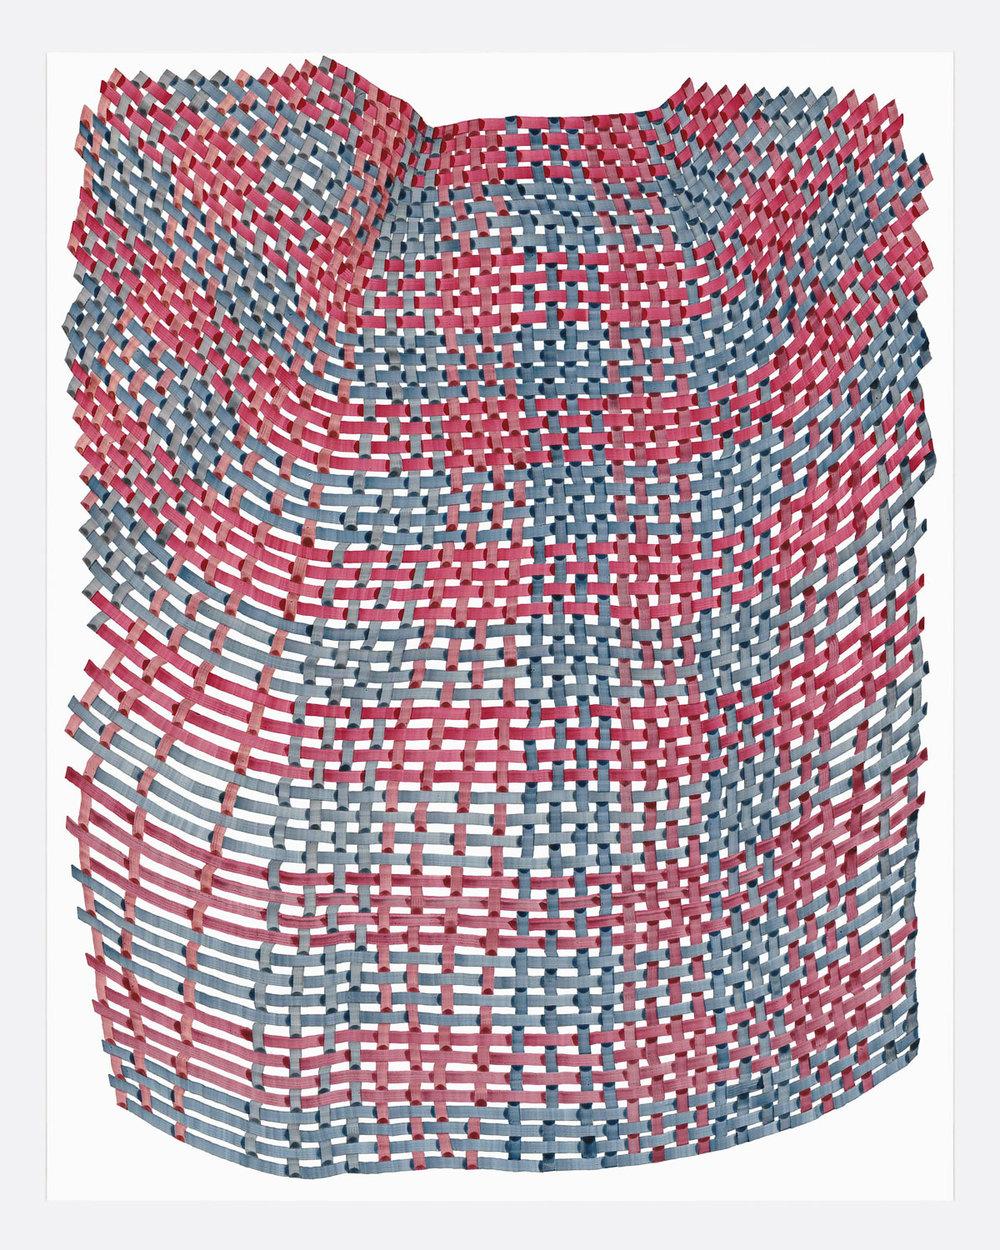 Woven Lines 8 ,  2019   acrylic on yupo medium 14 x 11 in (35.56 x 27.9 cm)